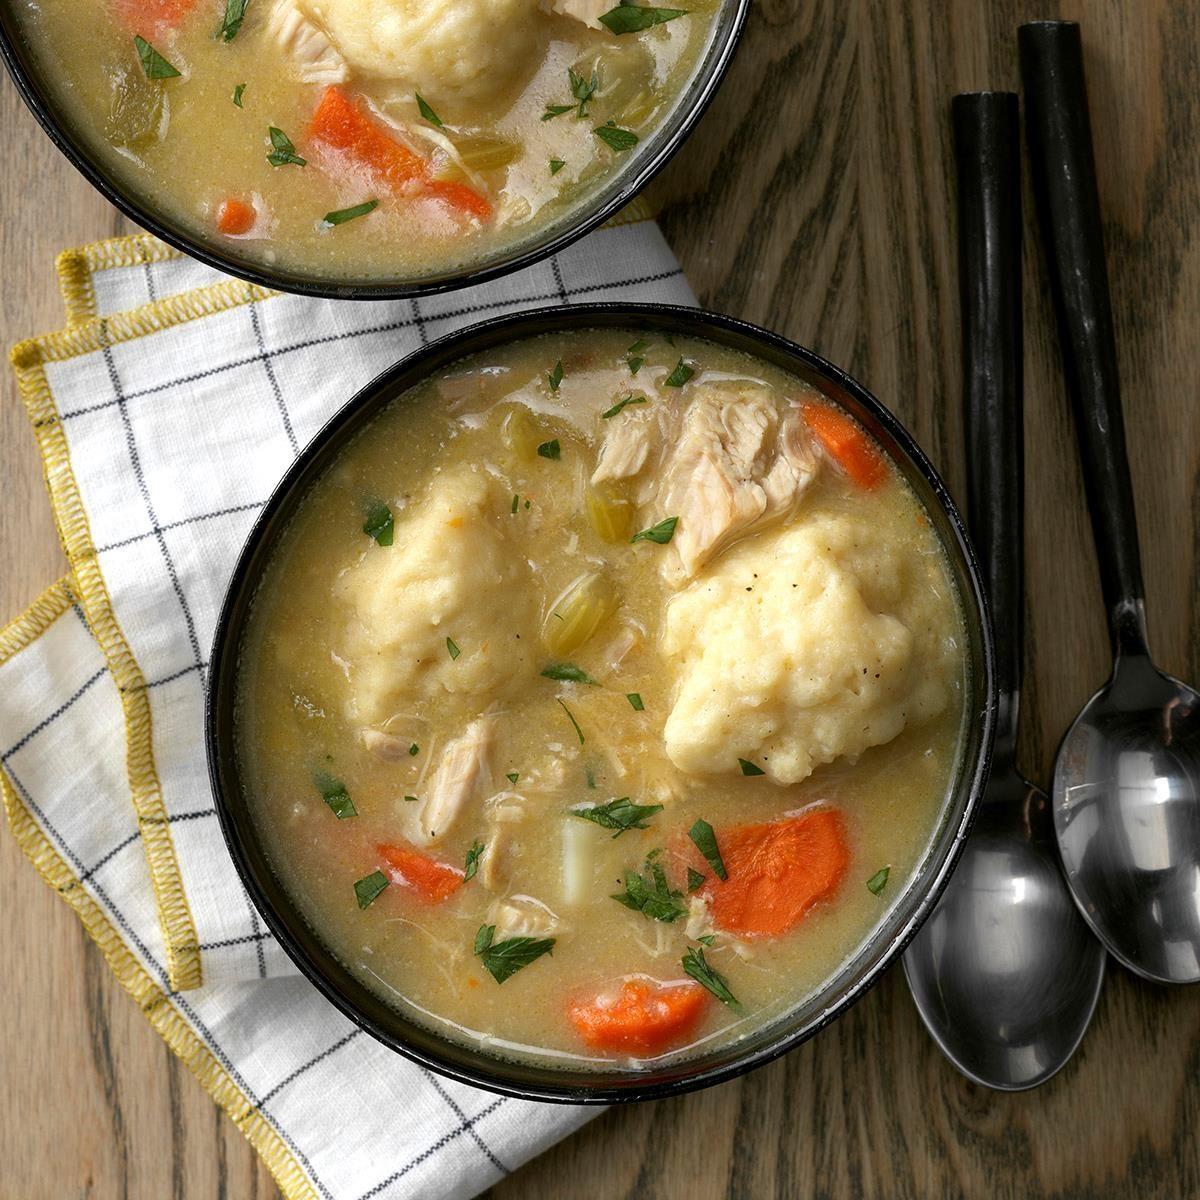 Grandma's Chicken 'n' Dumpling Soup Grandma's Chicken 'n' Dumpling Soup